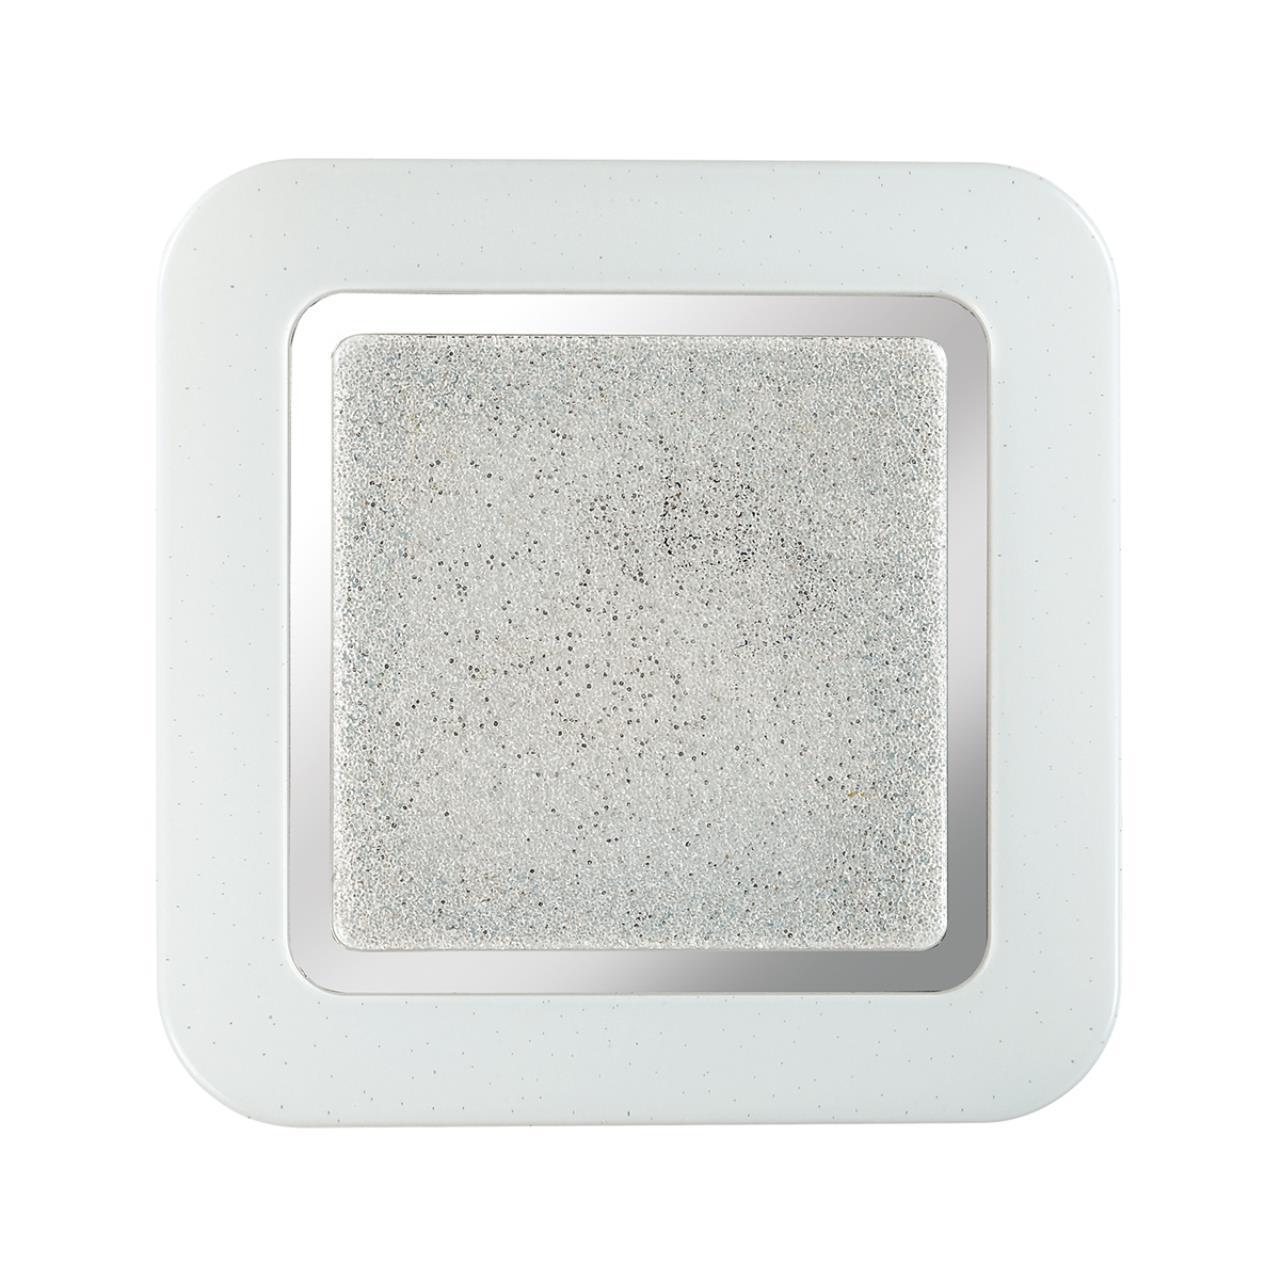 2080/DL SN 050 св-к PINO пластик LED 48Вт 3000-6000K 430*430 IP43 пульт ДУ